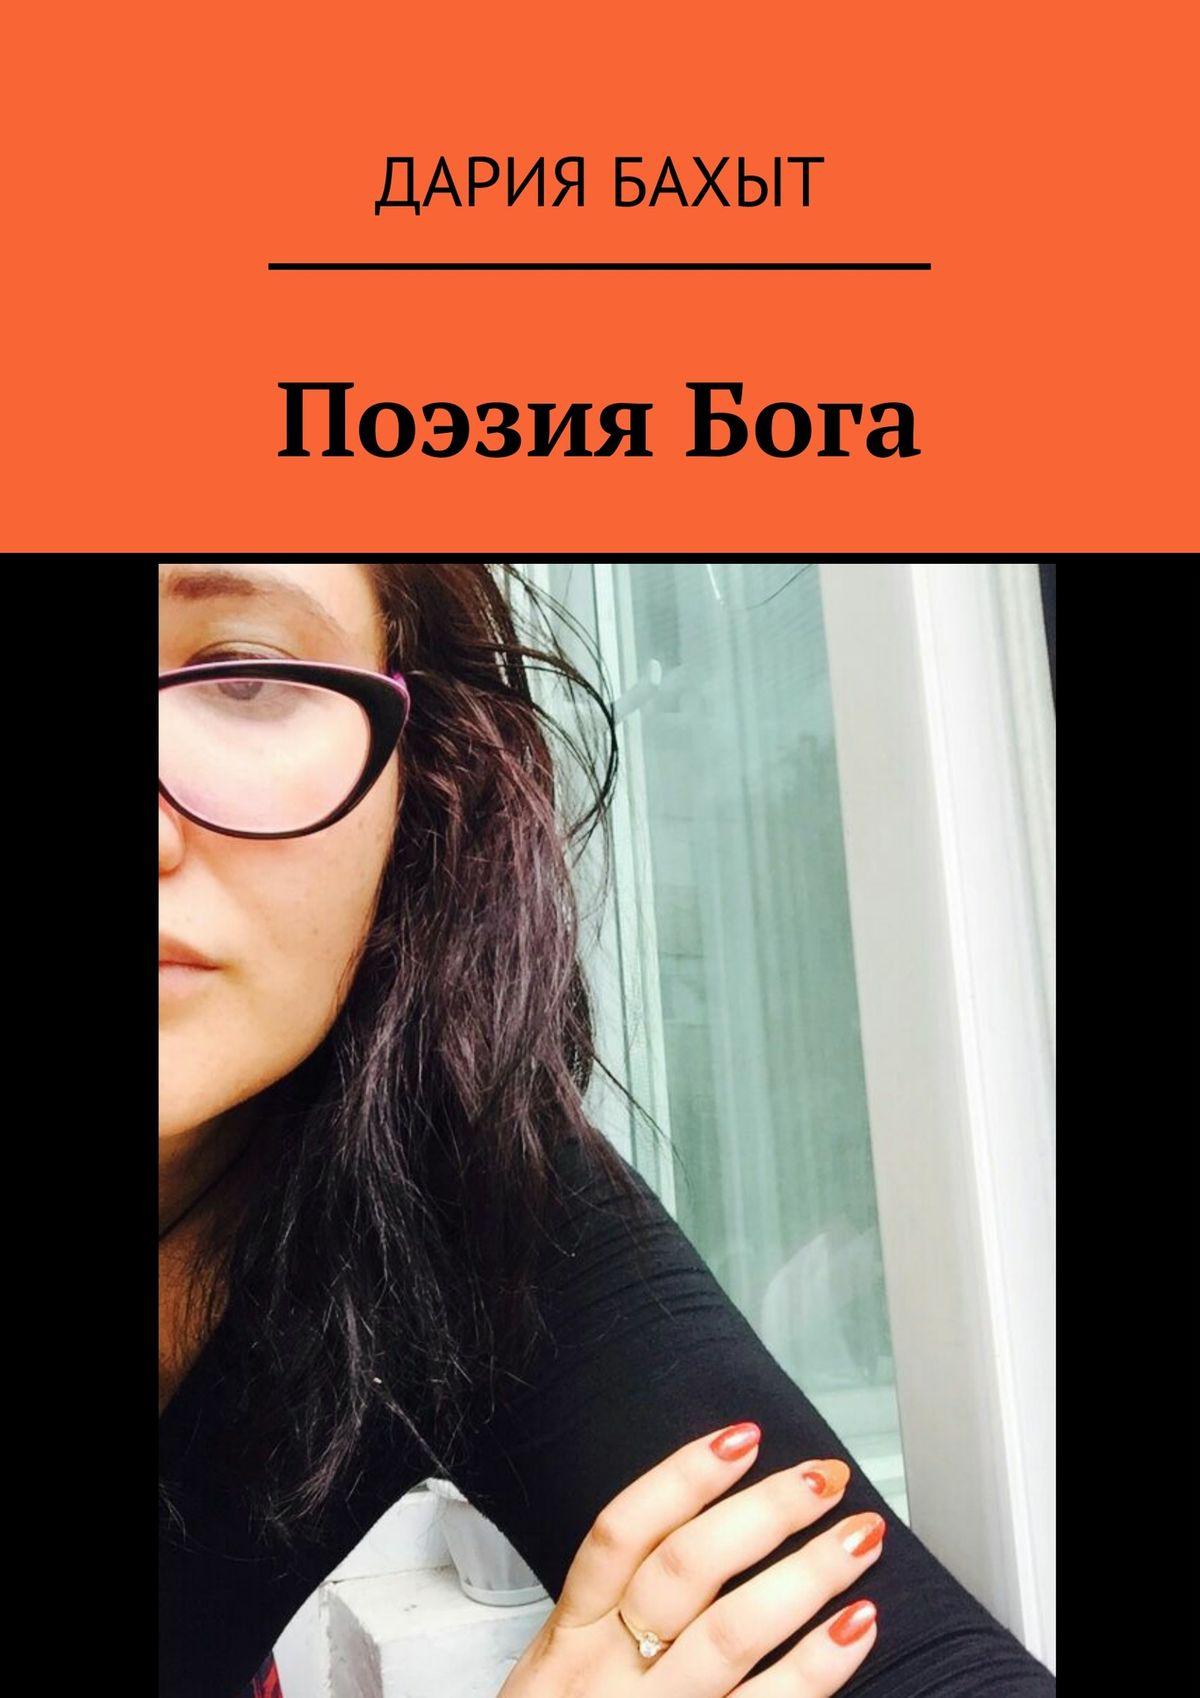 Дария Бахыт ПоэзияБога